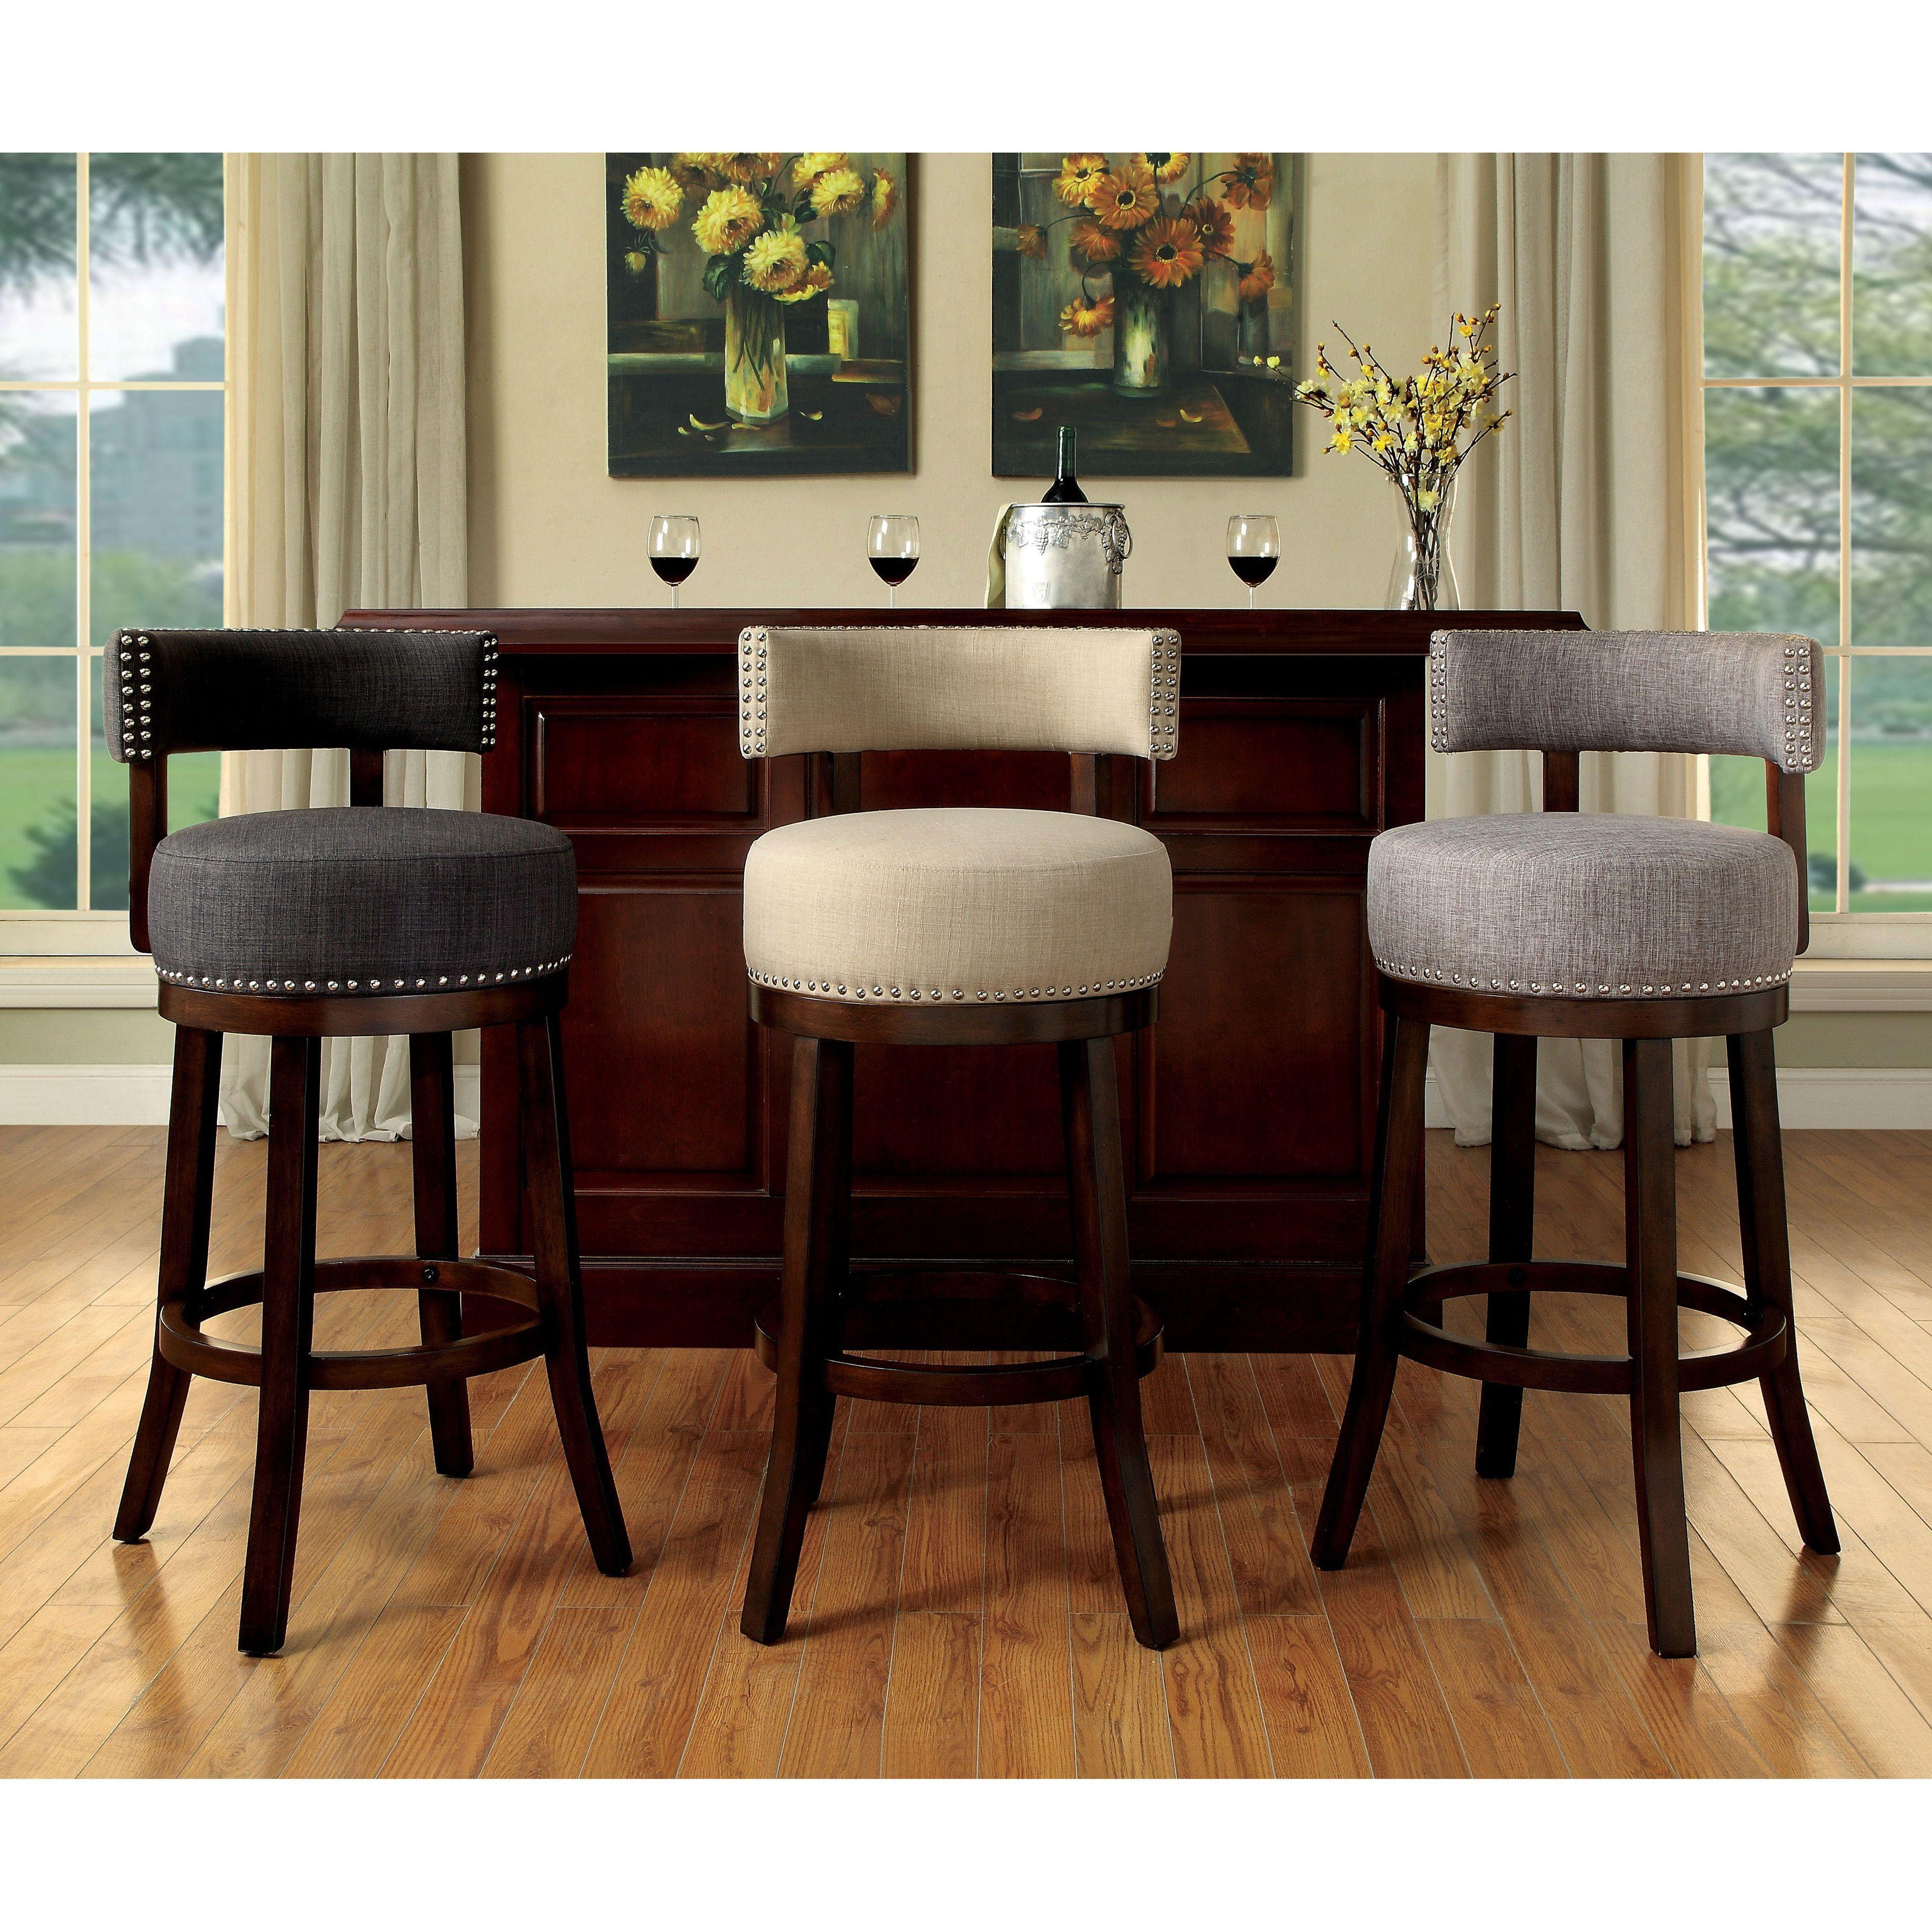 Prime Furniture Of America Fendeson Contemporary Fabric Nailhead Creativecarmelina Interior Chair Design Creativecarmelinacom